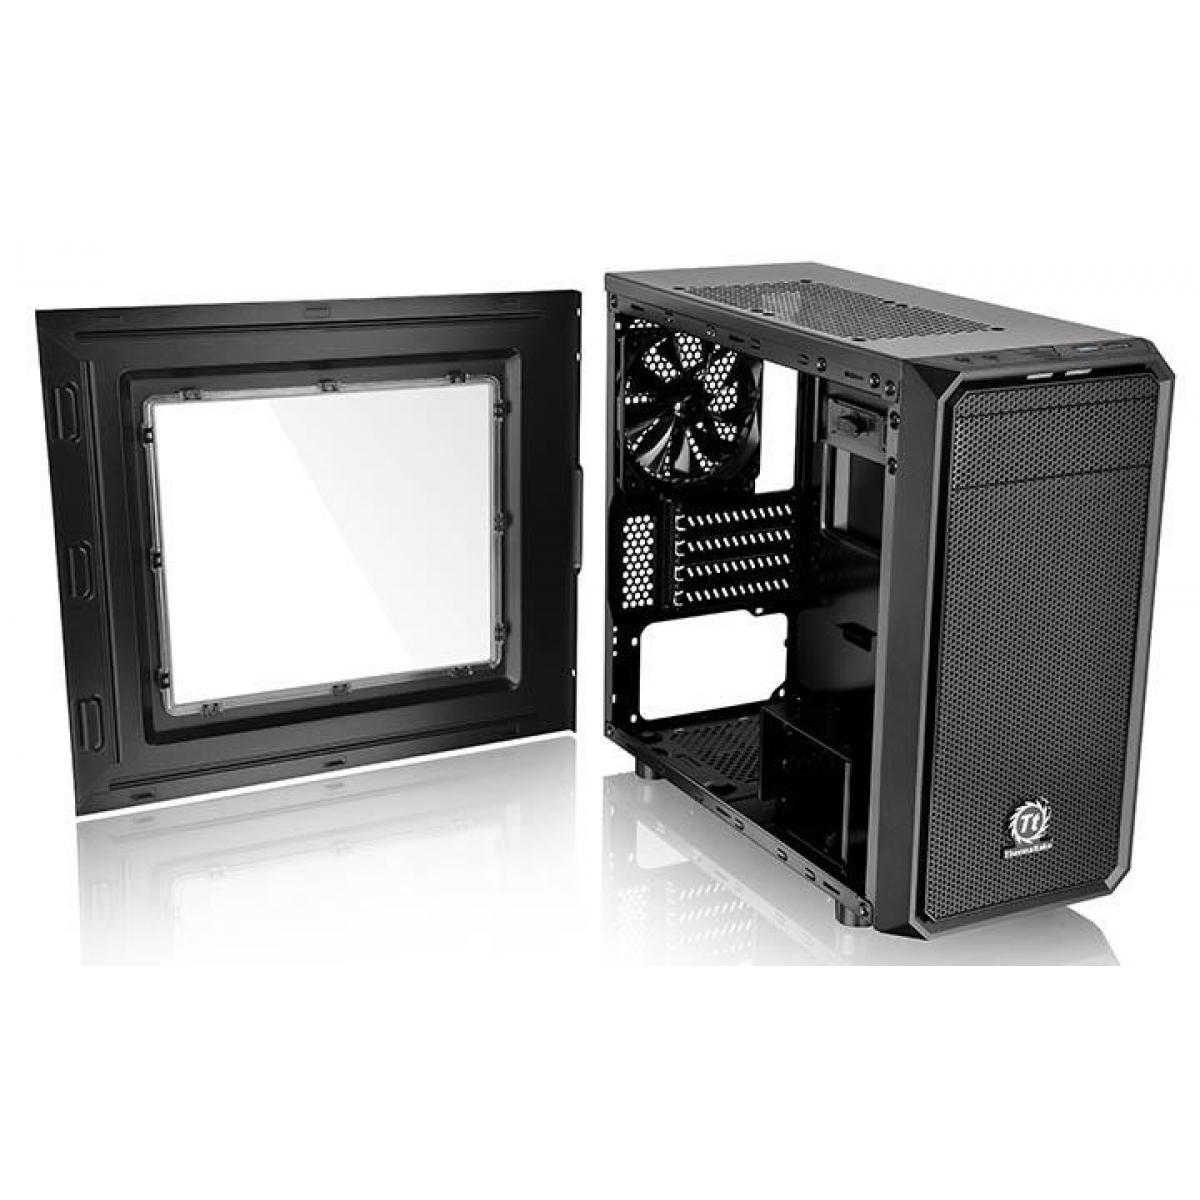 Gabinete Gamer Thermaltake Versa H15, Mini Tower, Com 1 Fan, Black, S-Fonte, CA-1D4-00S1WN-00